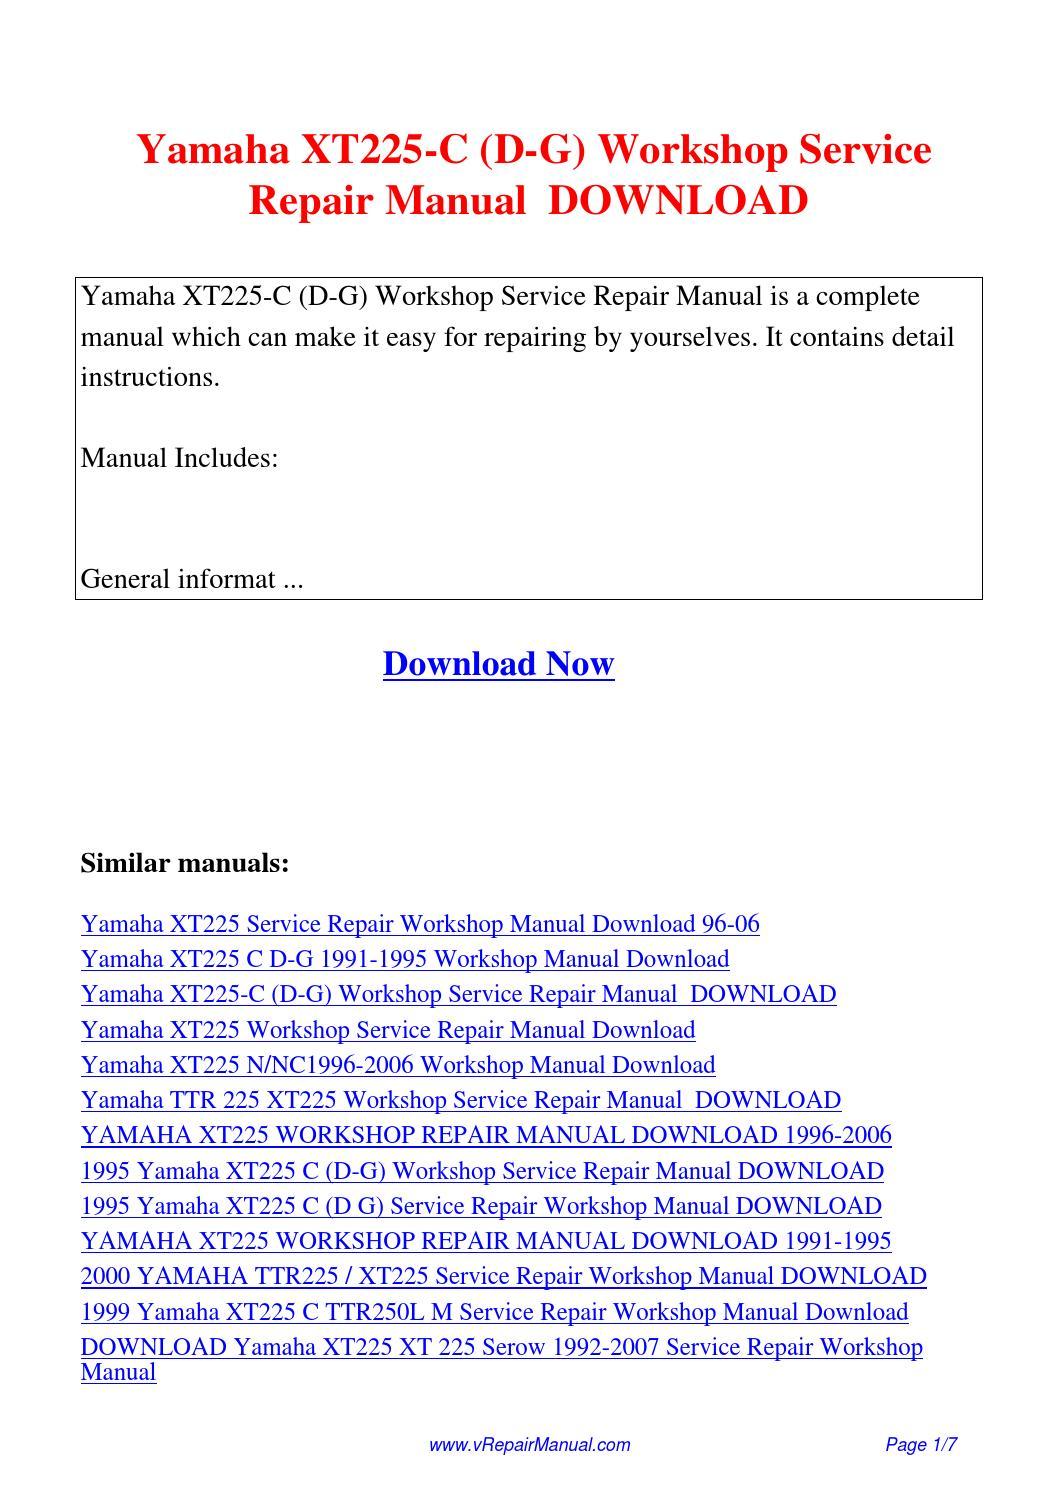 Yamaha XT225-C D-G Workshop Service Repair Manual.pdf by David Zhang - issuu